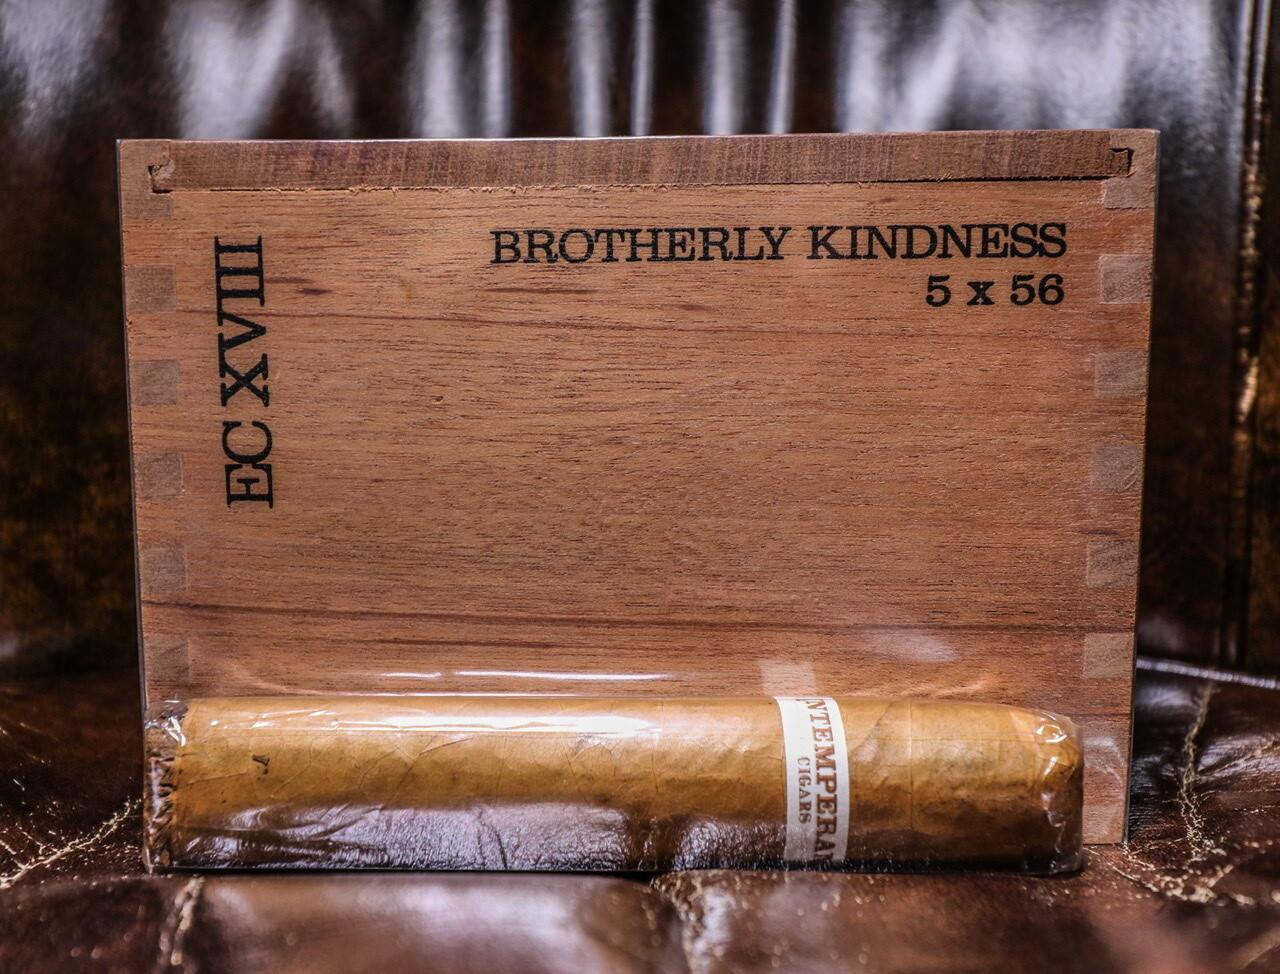 Brotherly Kindness 5x56, Intemperance EC XVIII Robusto Extra 24's